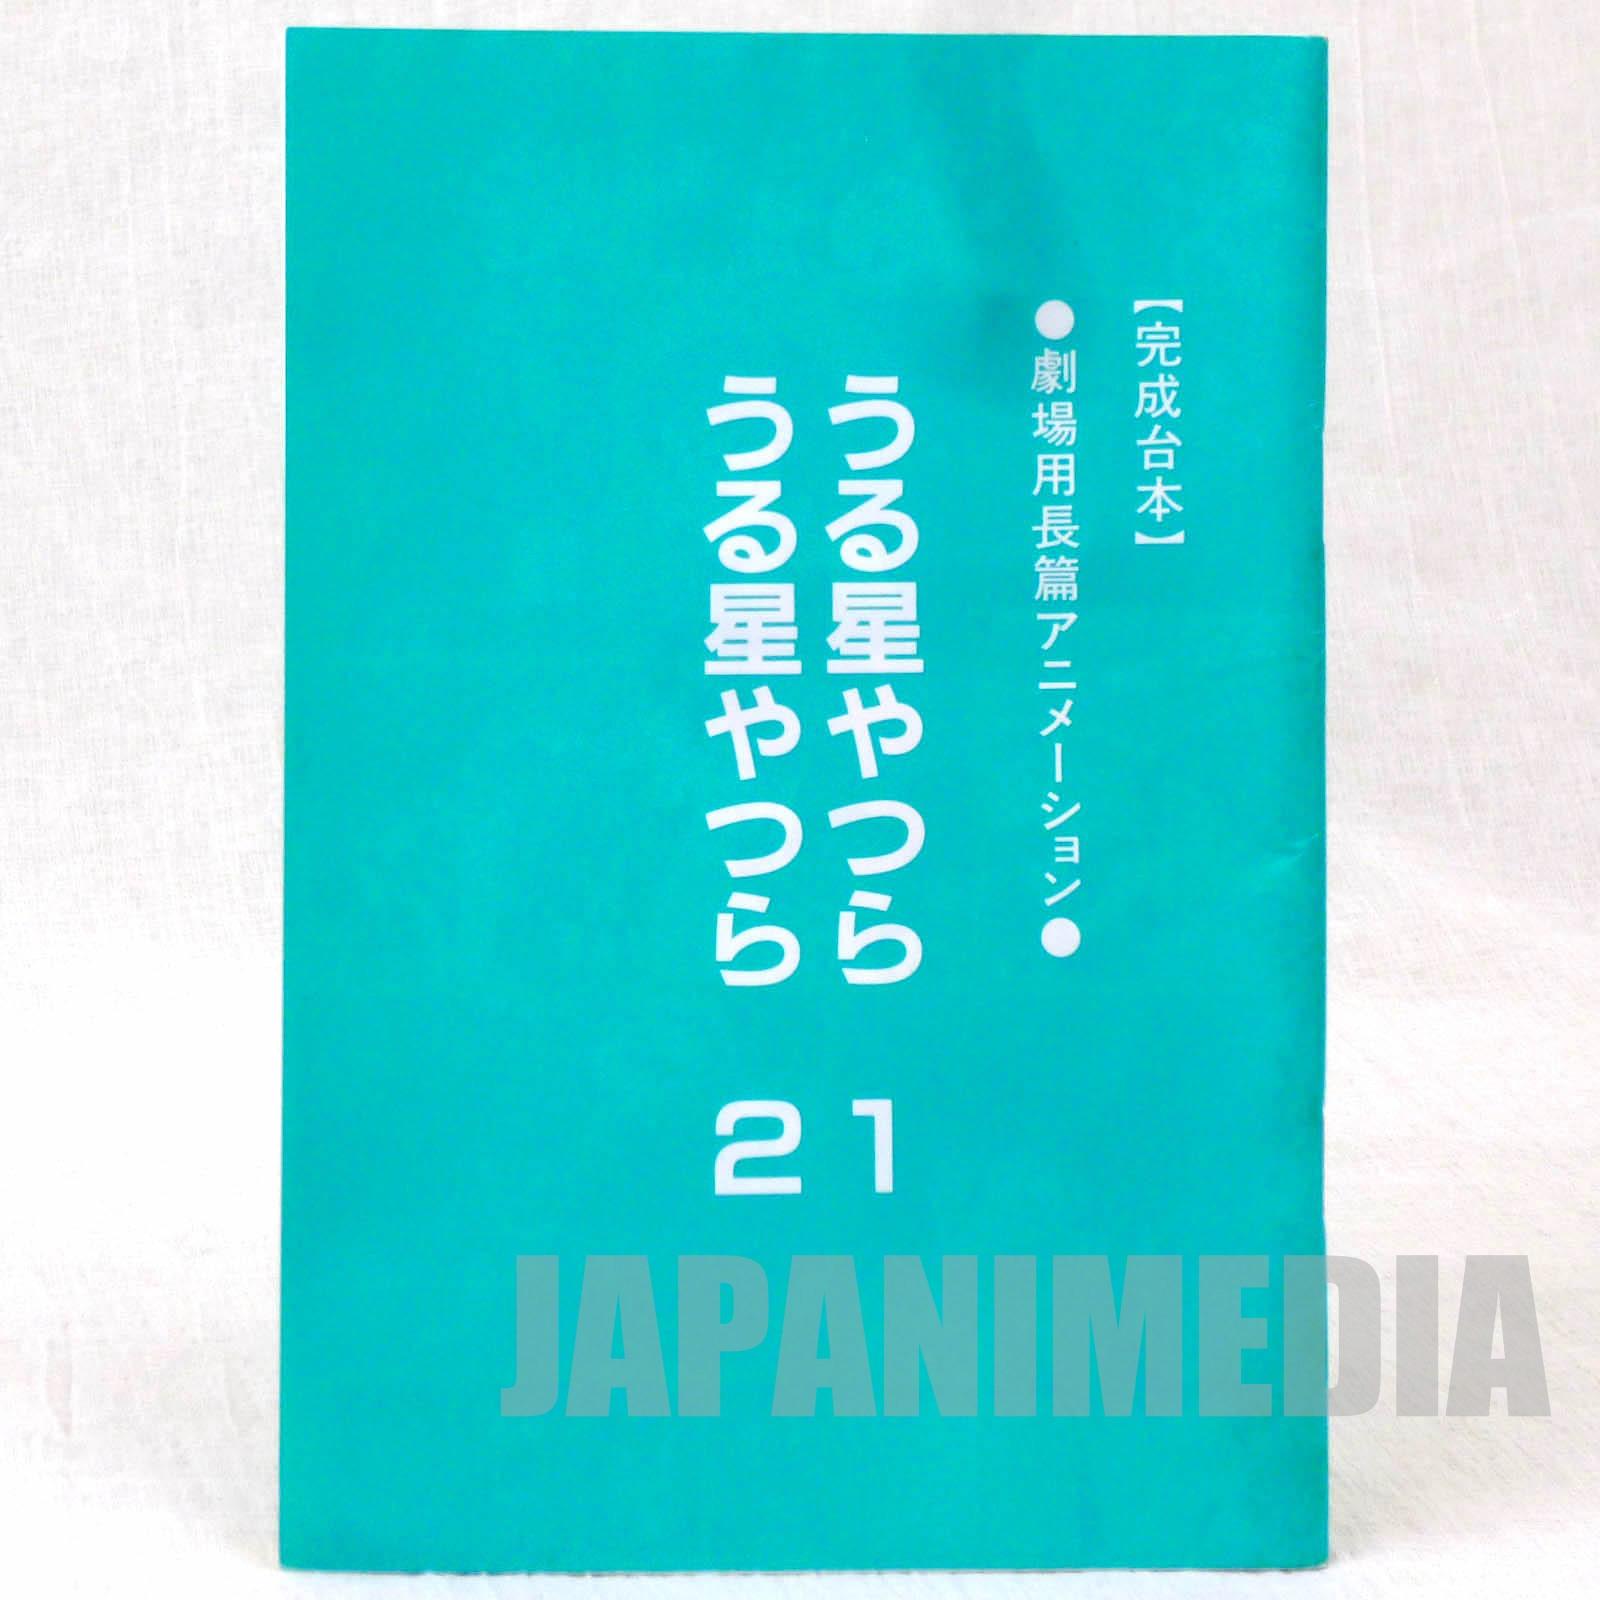 RARE!! Urusei Yatsura Only You & Beautiful Dreamer Urusei Yatsura FC original scenario Book (Fan club members exclusive Book) JAPAN ANIME